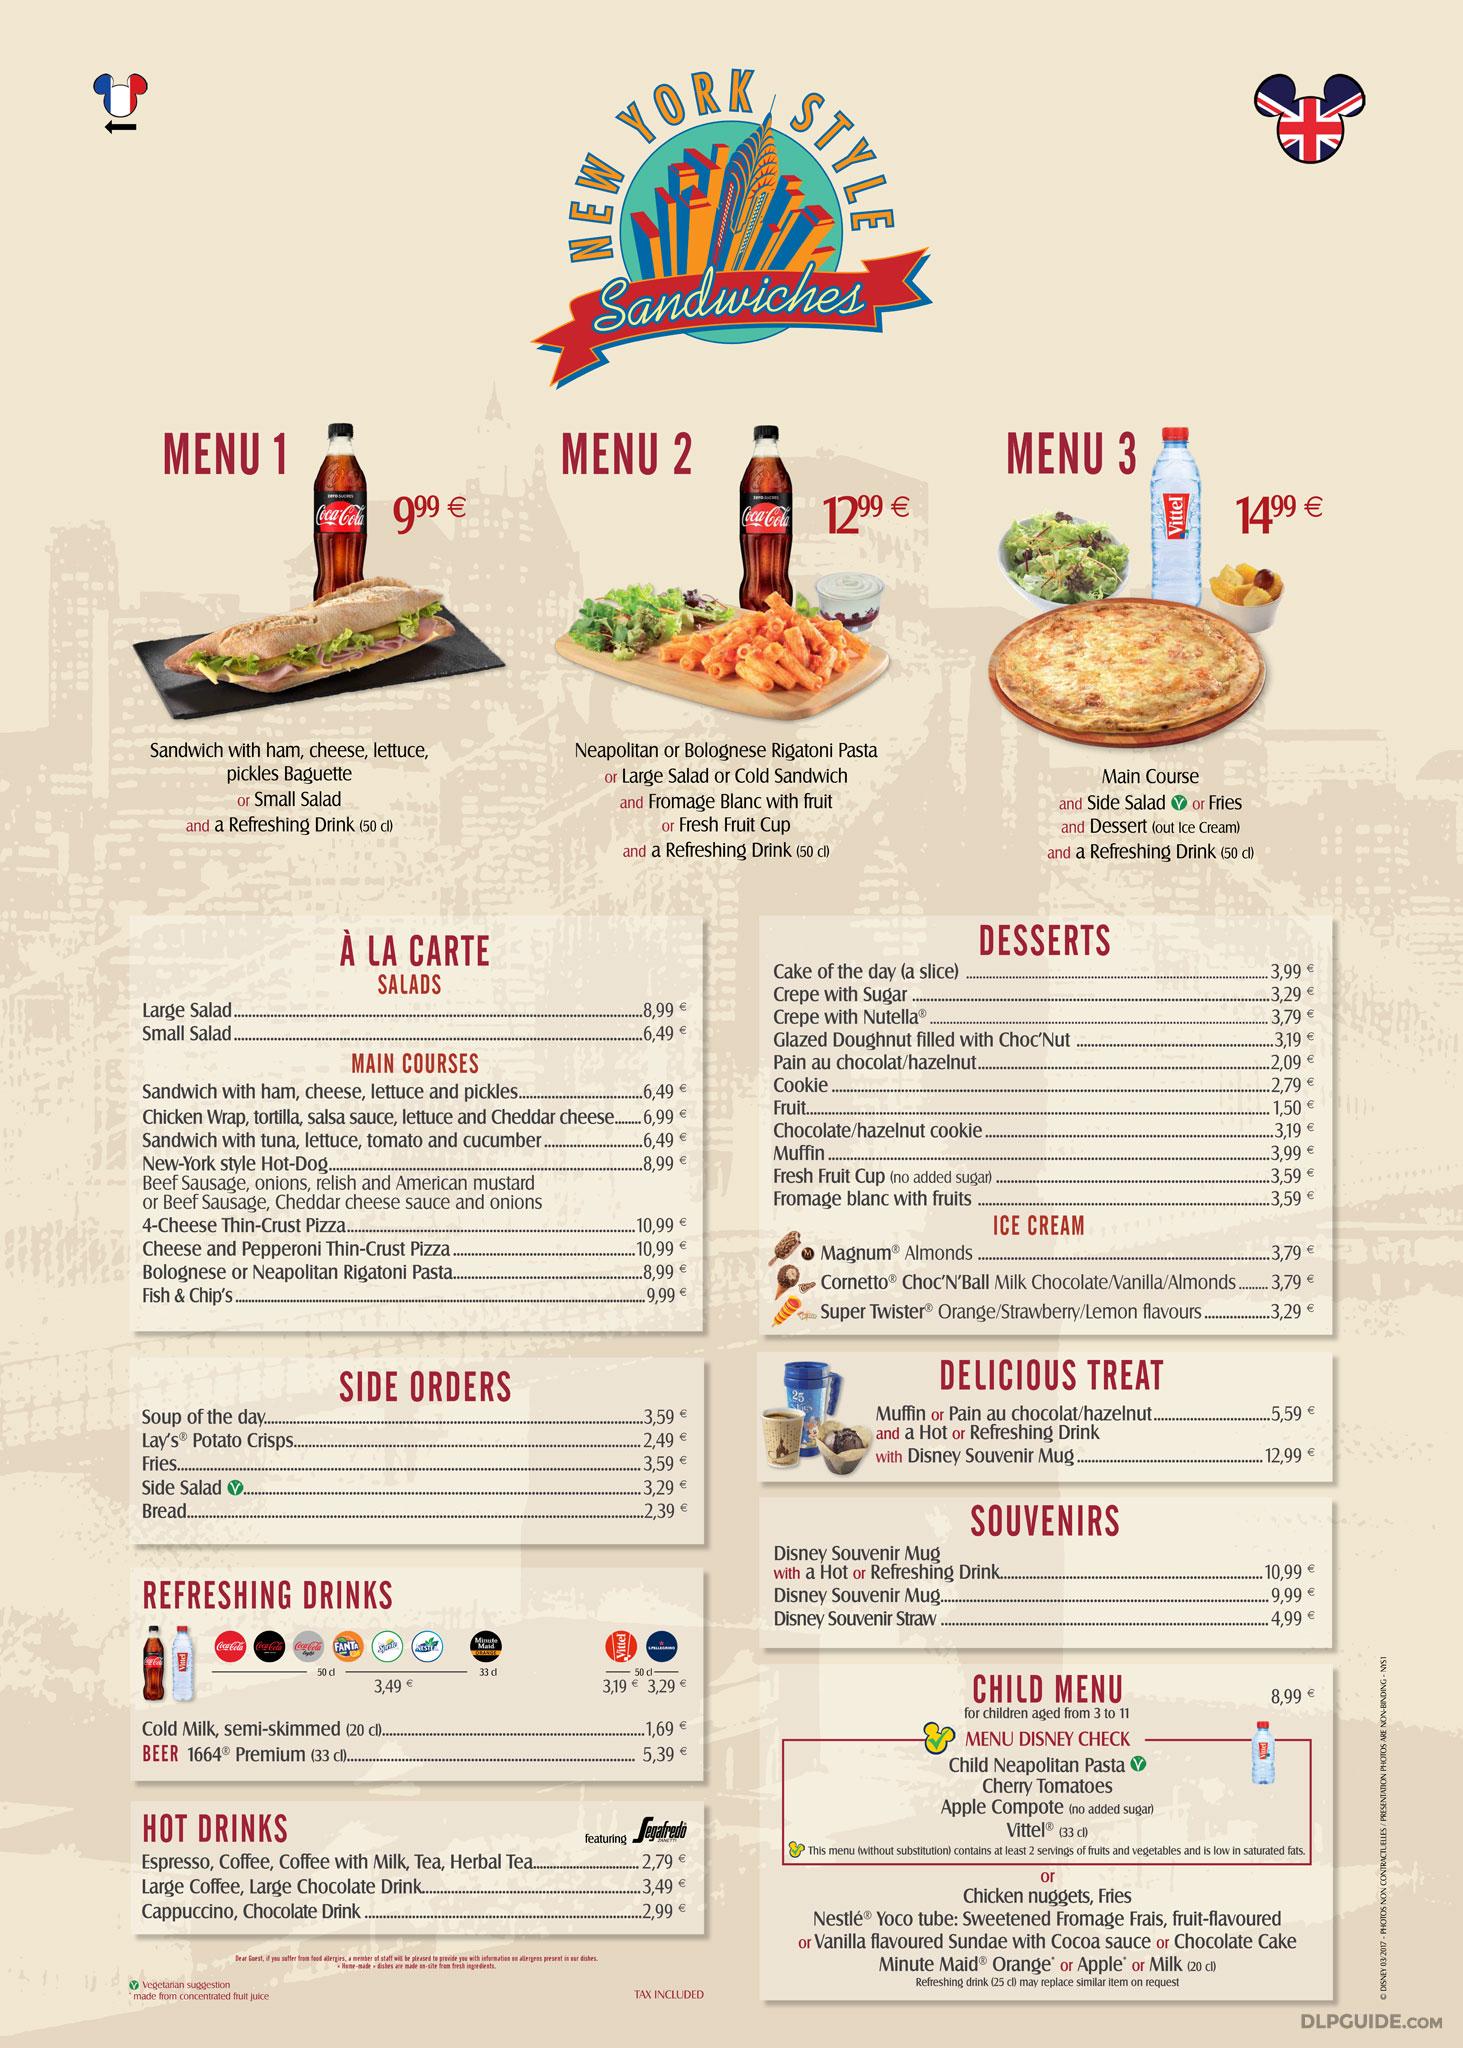 new york style sandwiches menu — dlp guide • disneyland